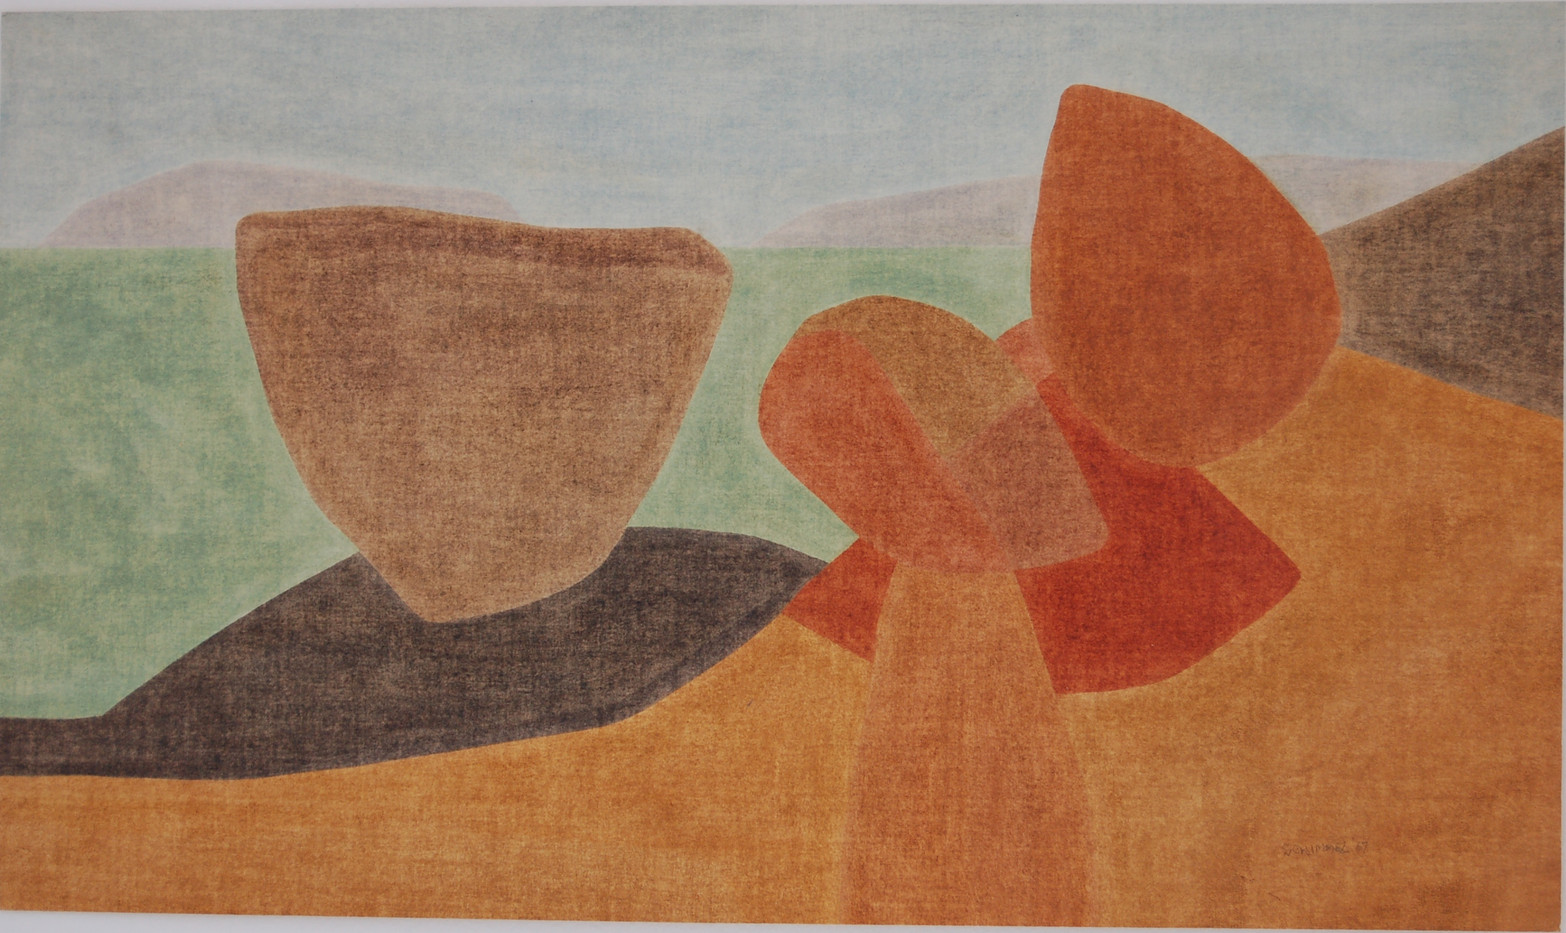 Fred Schimmel | Landscape Formations | 1967 | Oil on Paper | 39.5 x 68 cm